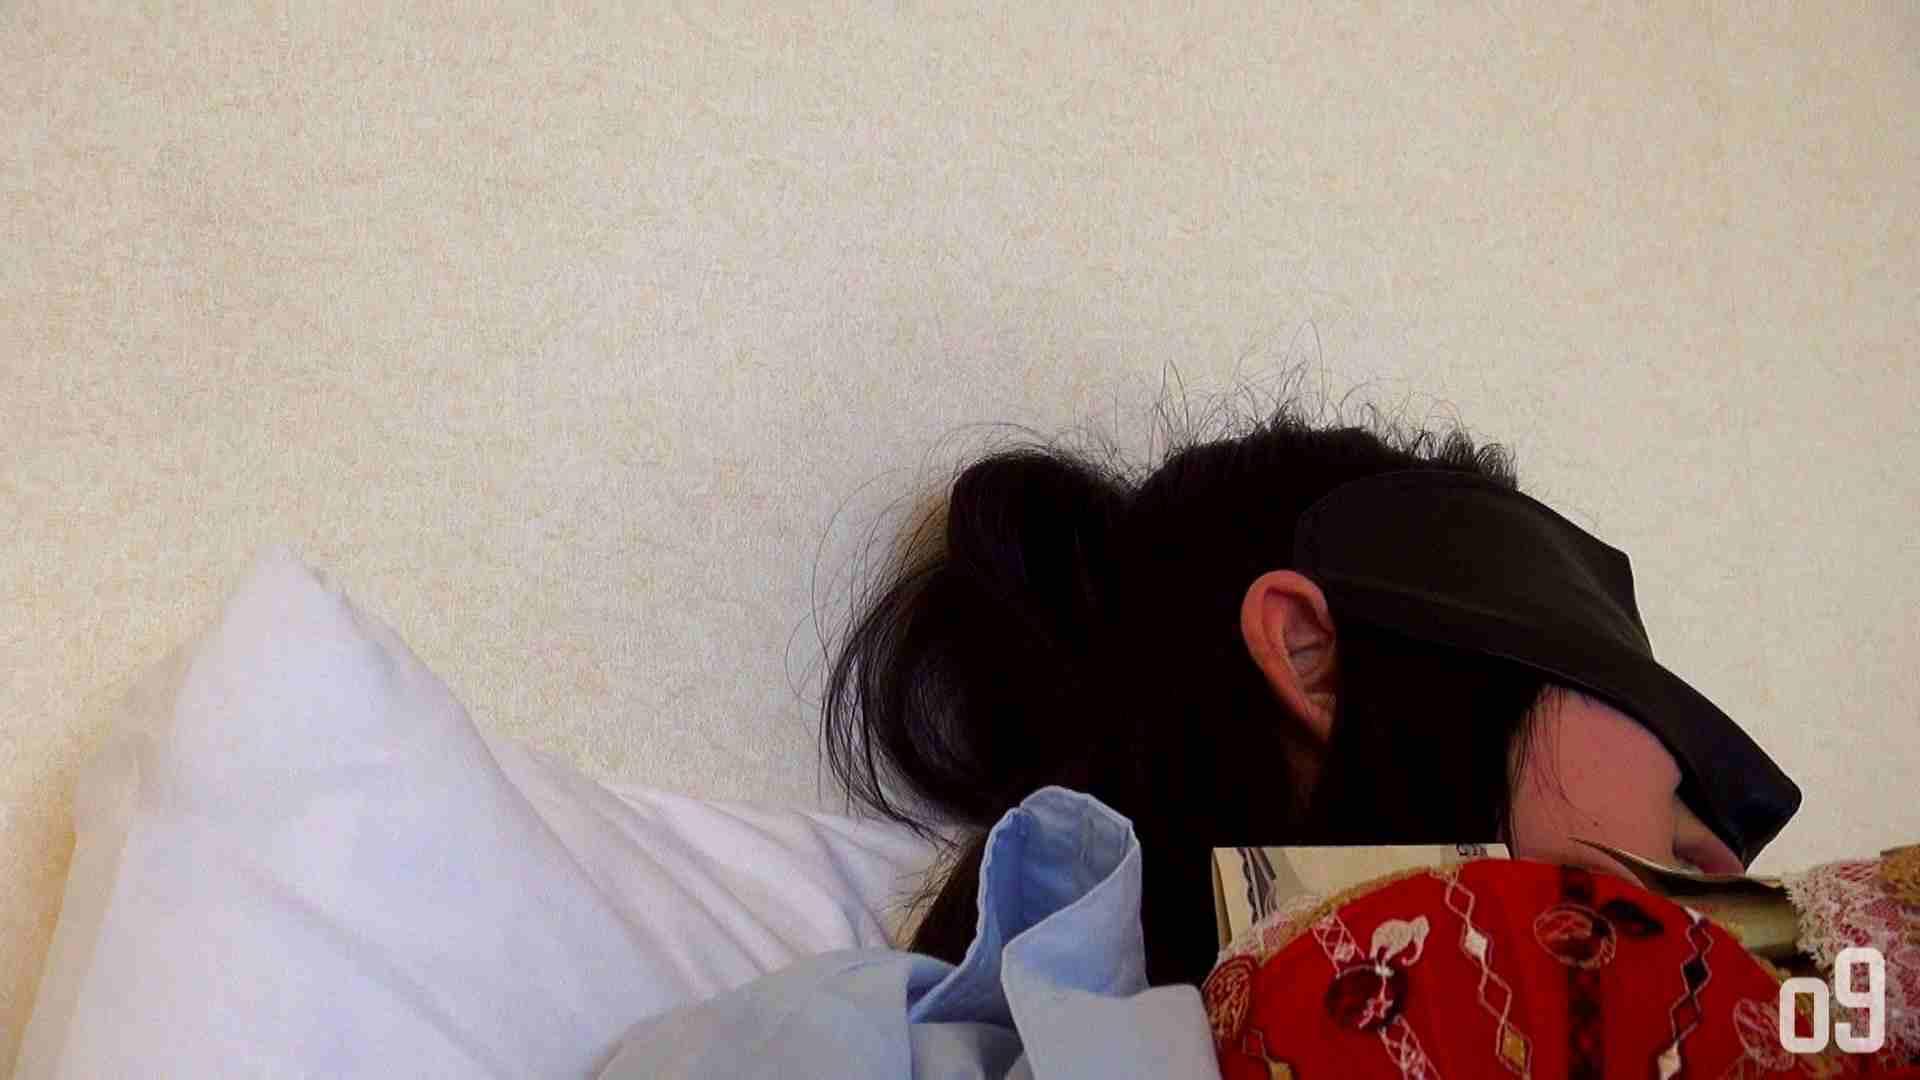 vol.6 TKSさんが震える!留華ちゃんの不慣れな手コキで念願の射精! OLハメ撮り  94Pix 29